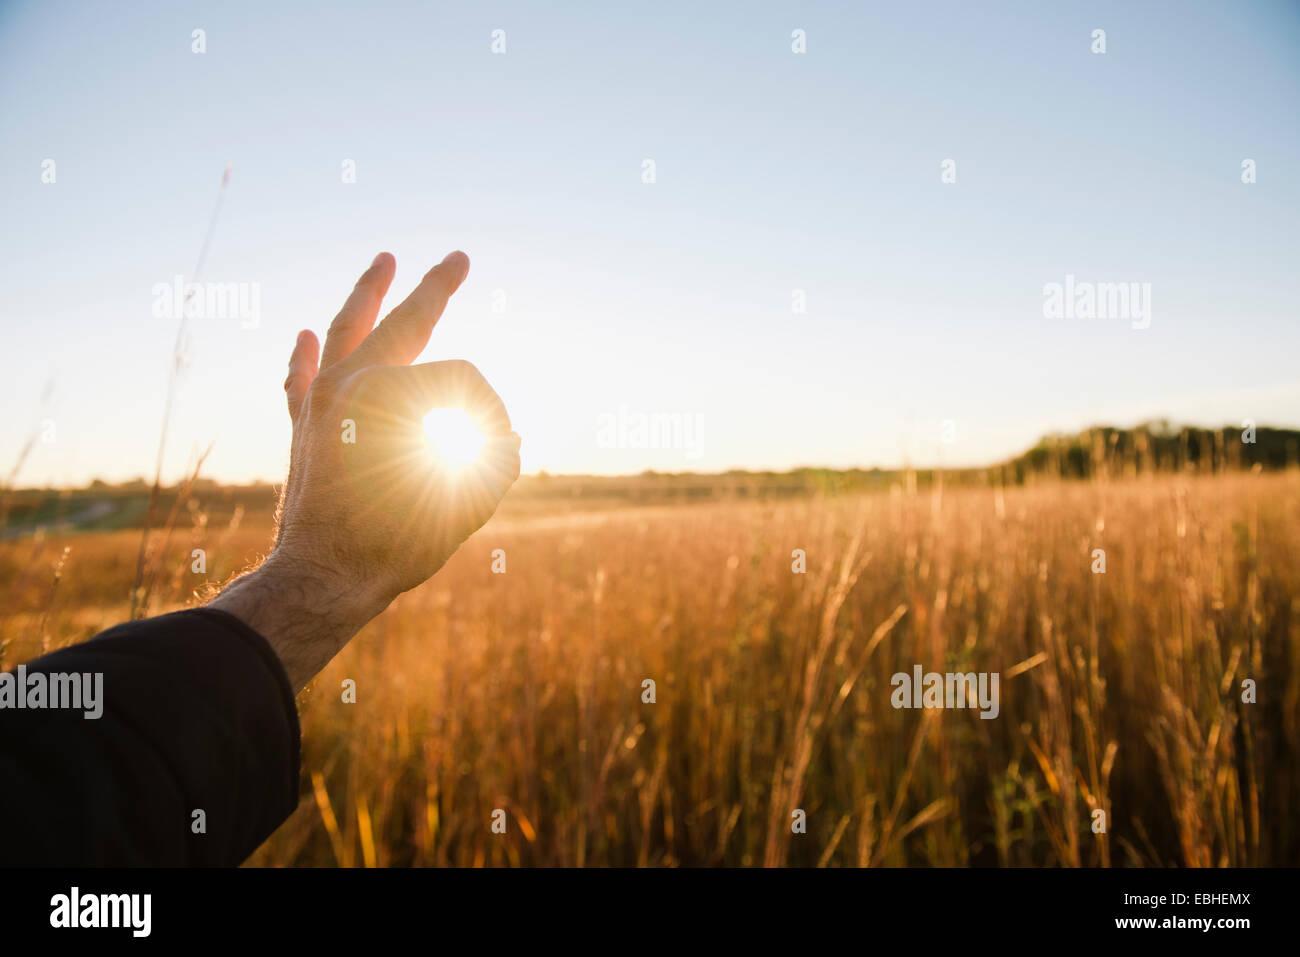 Hand of farmer encircling sun in wheat field at dusk, Plattsburg, Missouri, USA - Stock Image